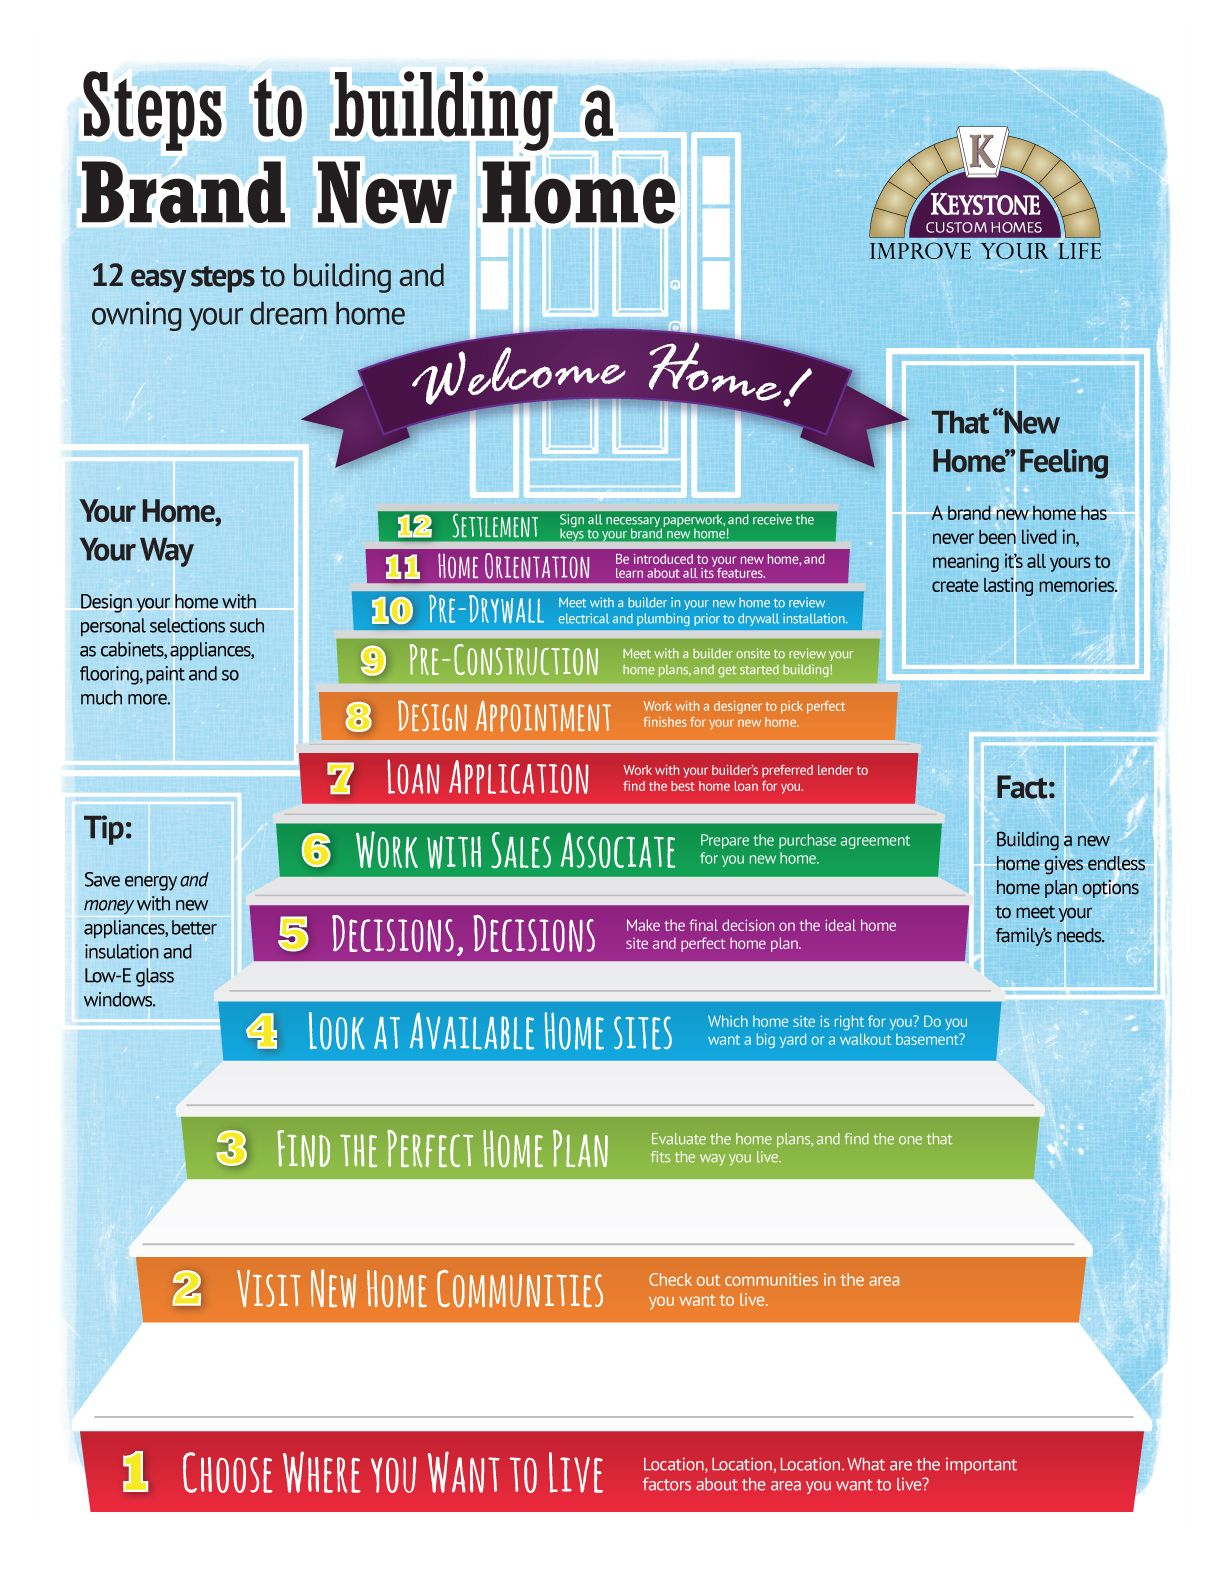 12 steps to build a brand new home